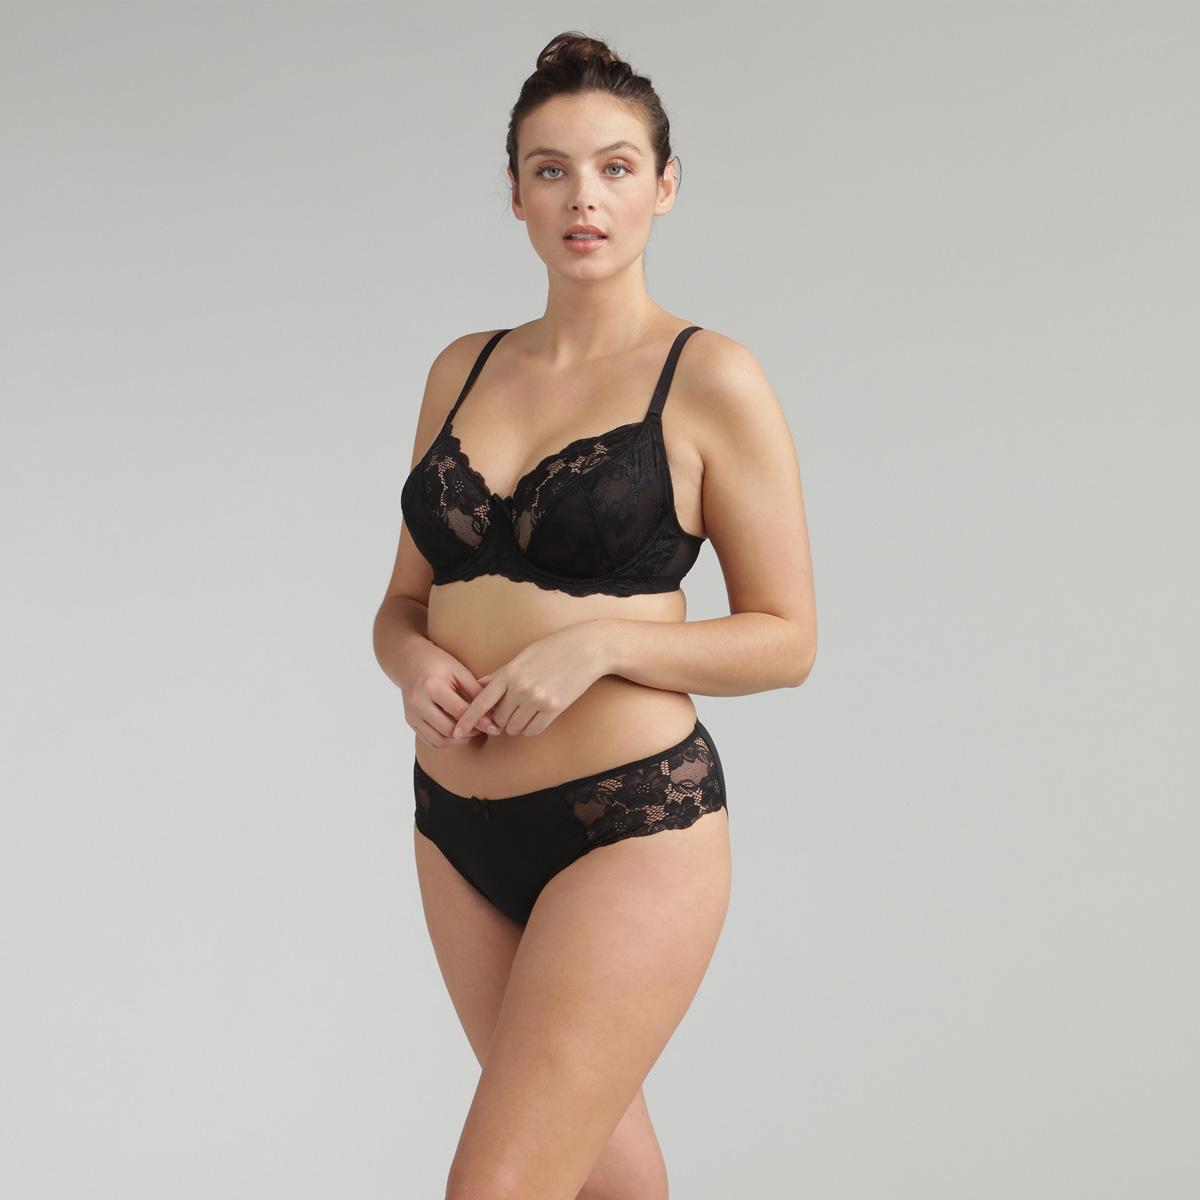 Bikini Knickers in Black Lace Essential Elegance, , PLAYTEX